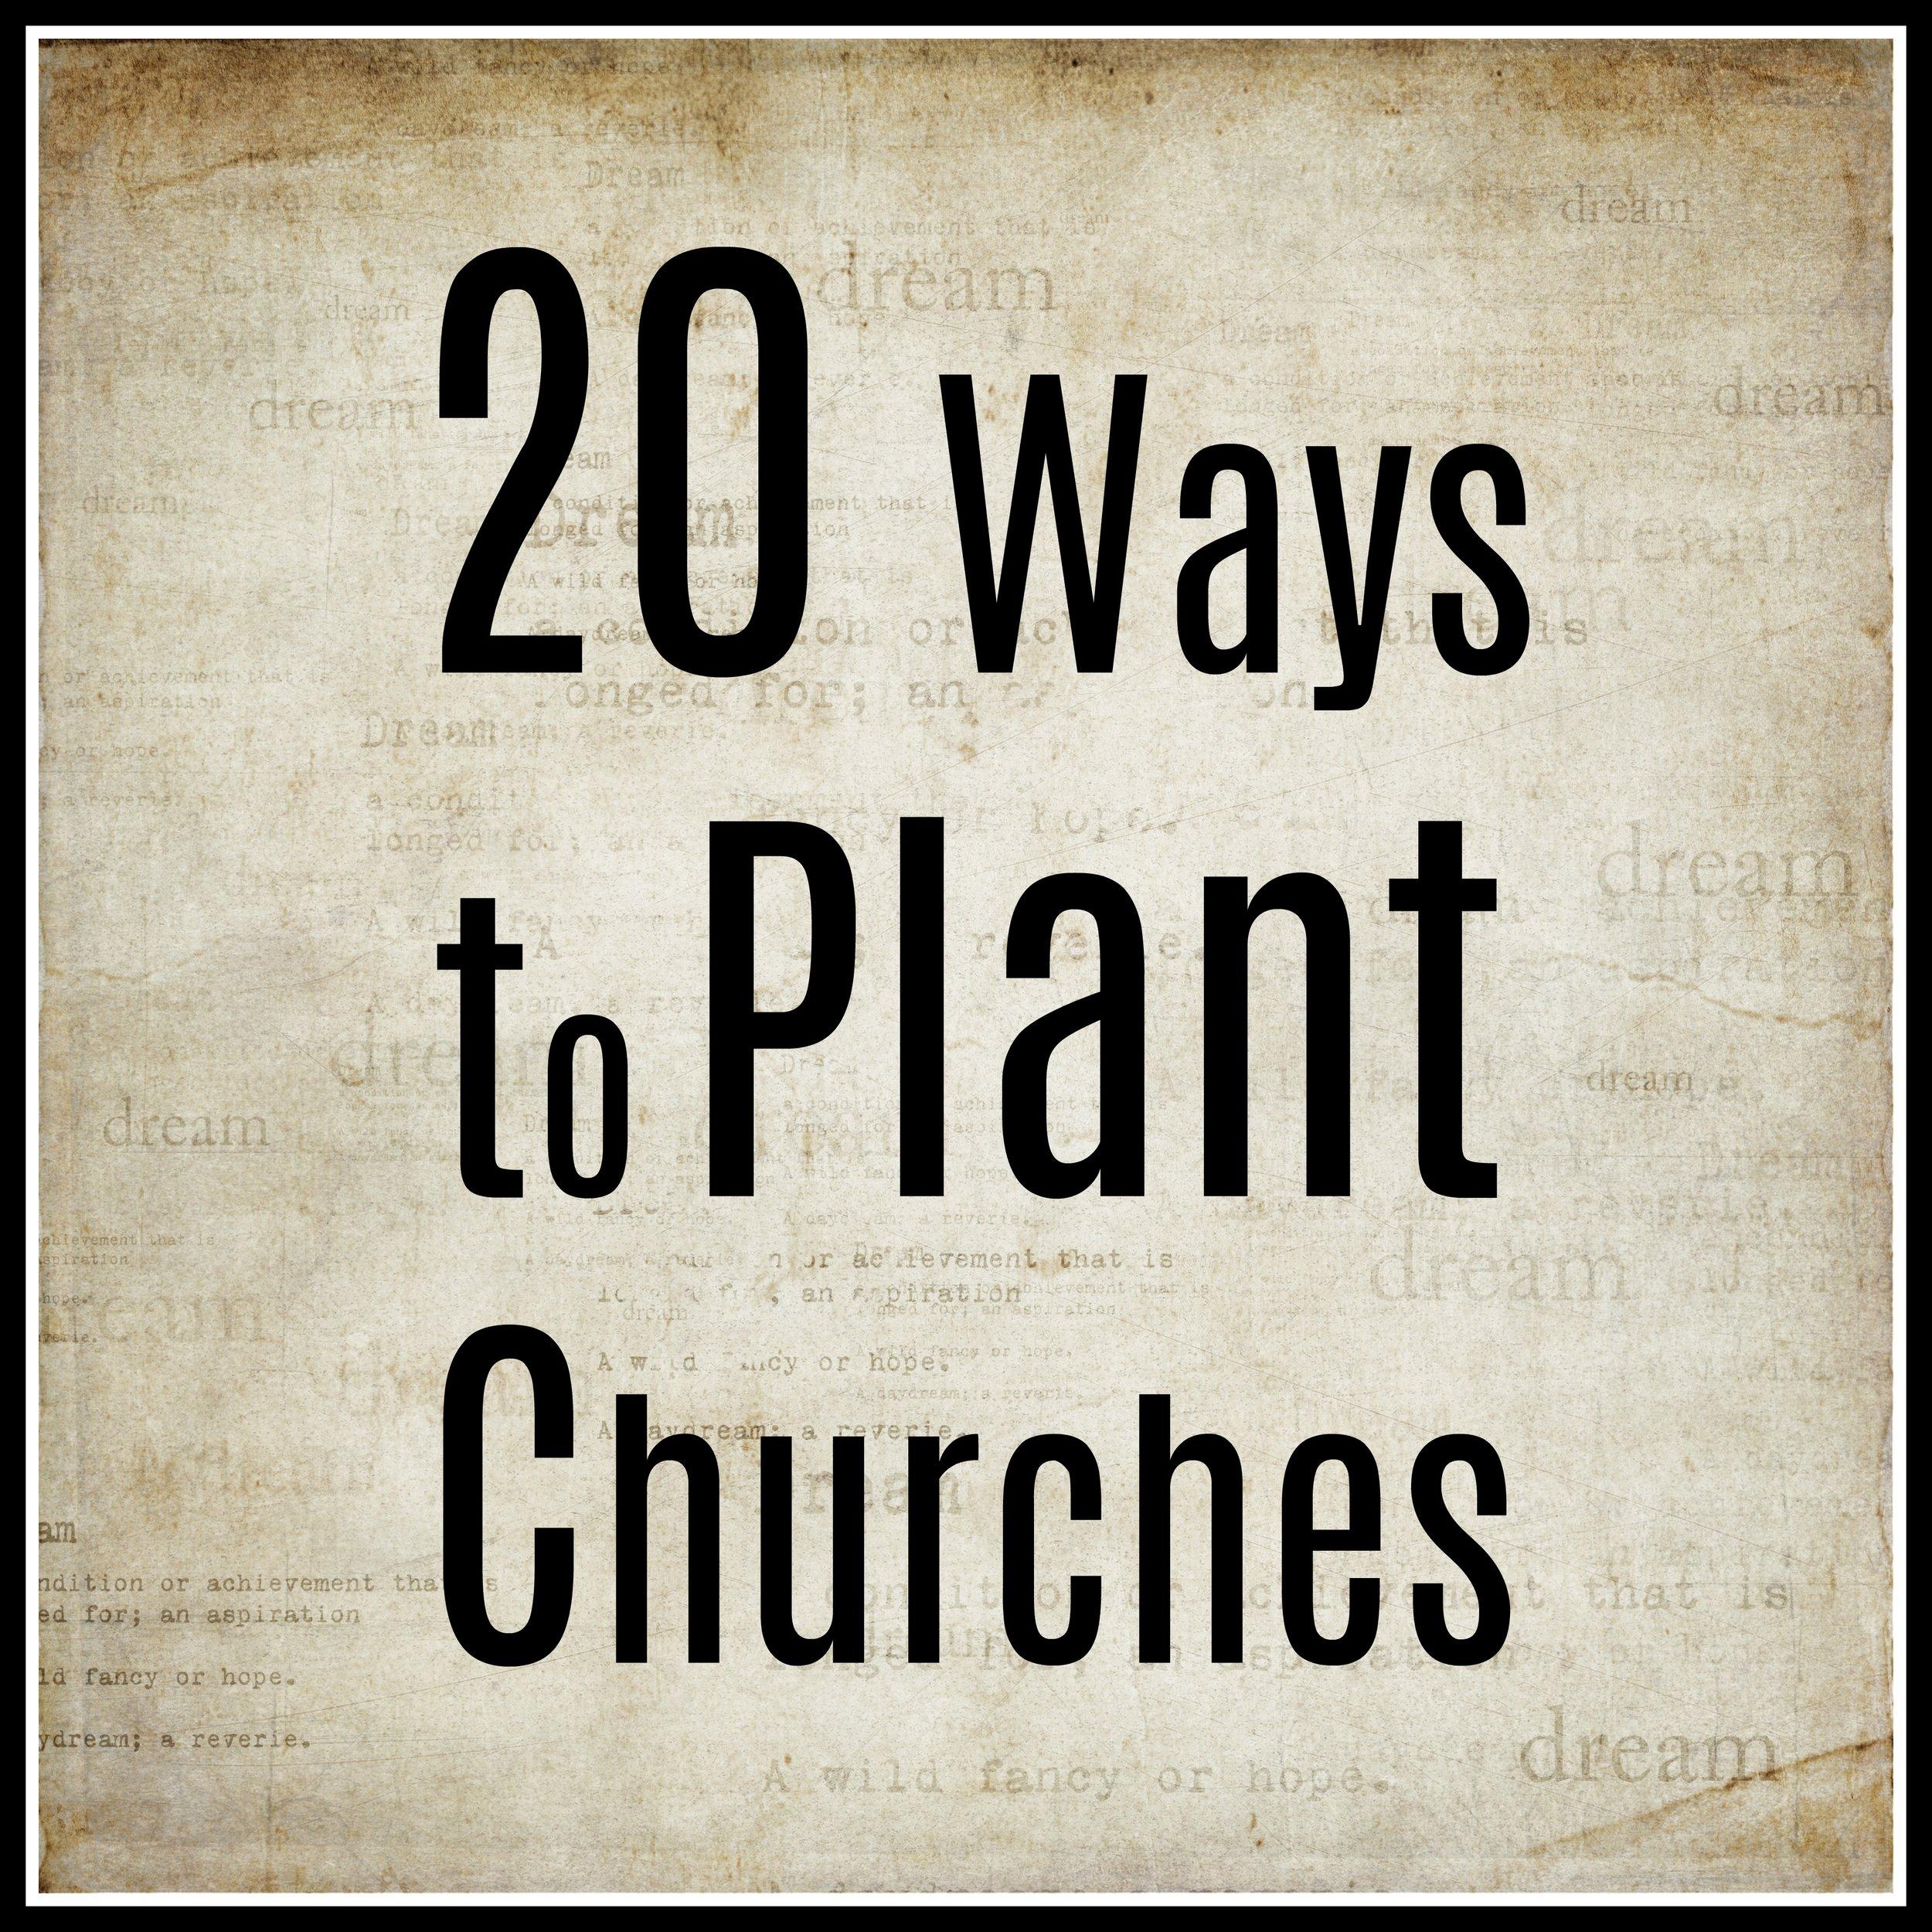 Twenty Ways to Plant Churches.jpg